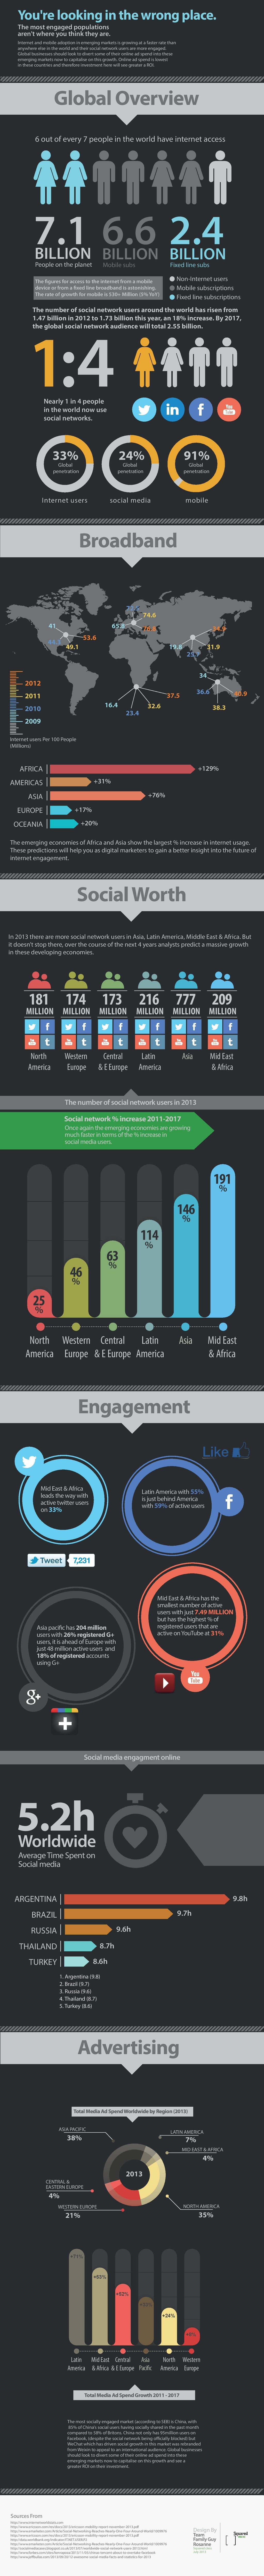 Date despre internet, mobile, social media & more